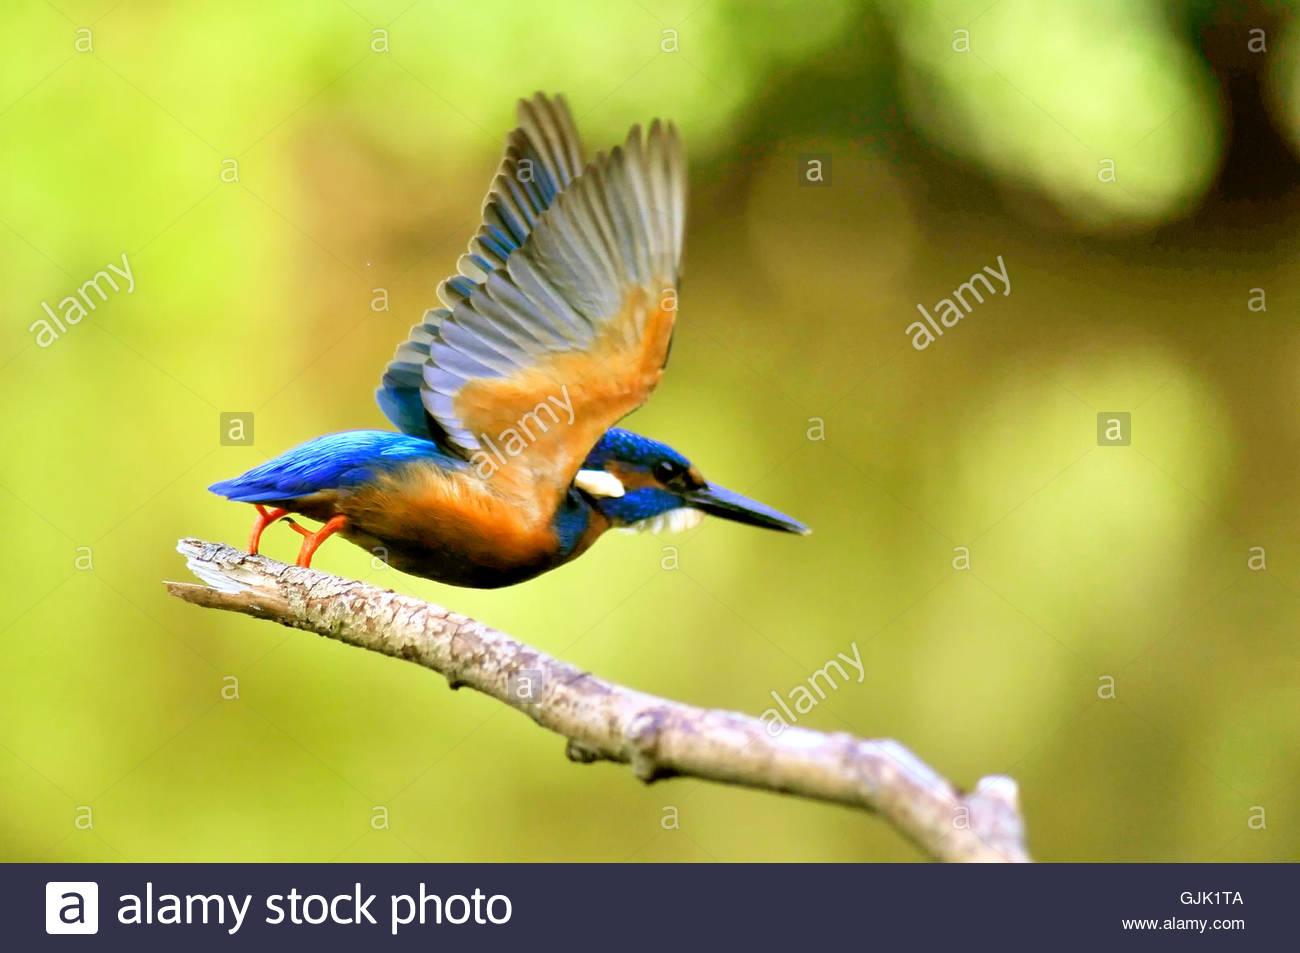 animal animals kingfisher - Stock Image